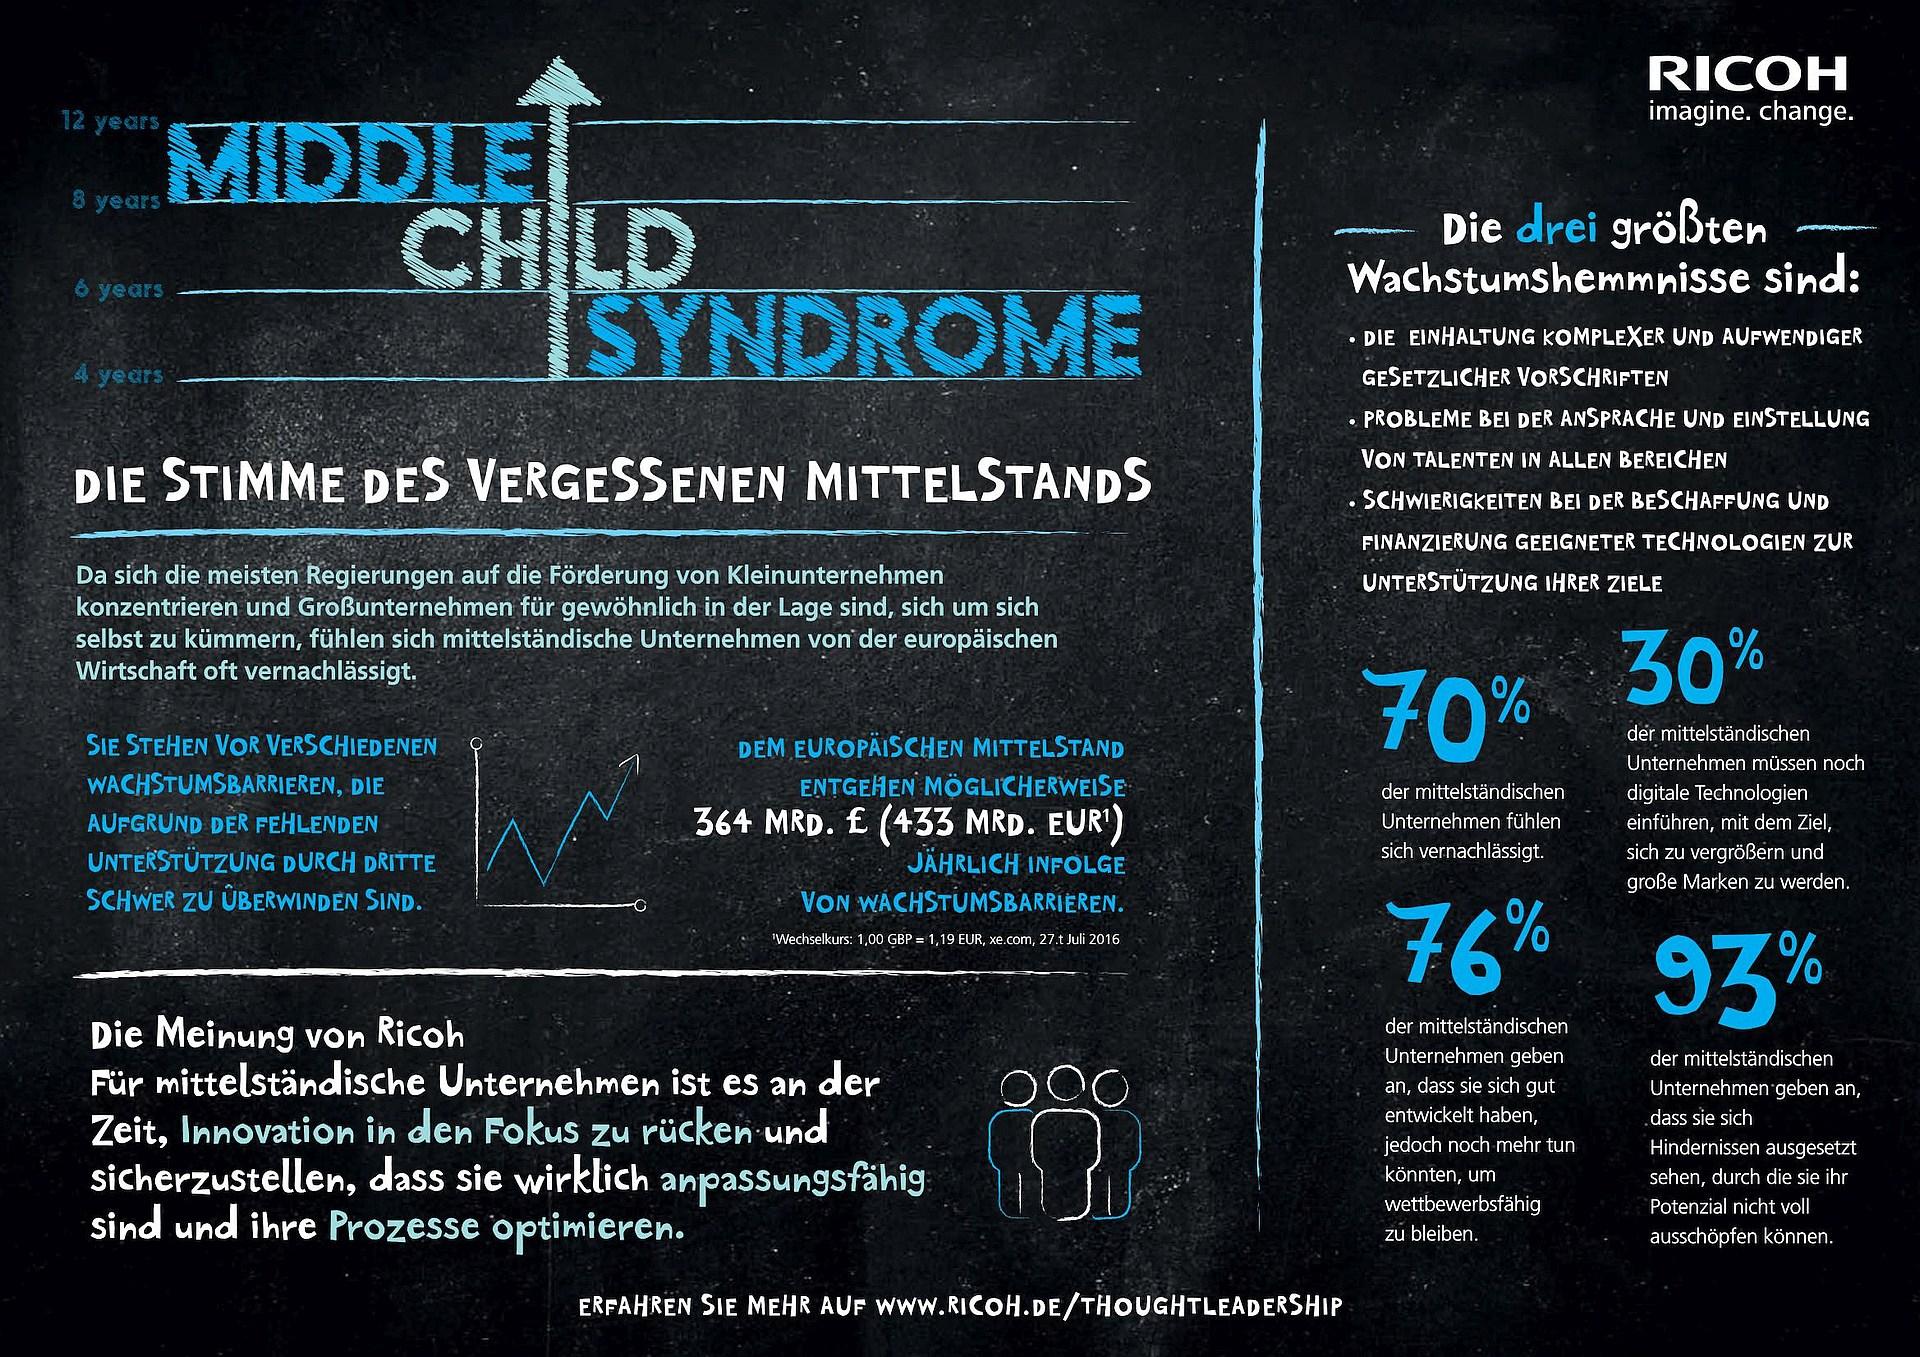 infografik-ricoh-mittelstand-middle-child-syndrome